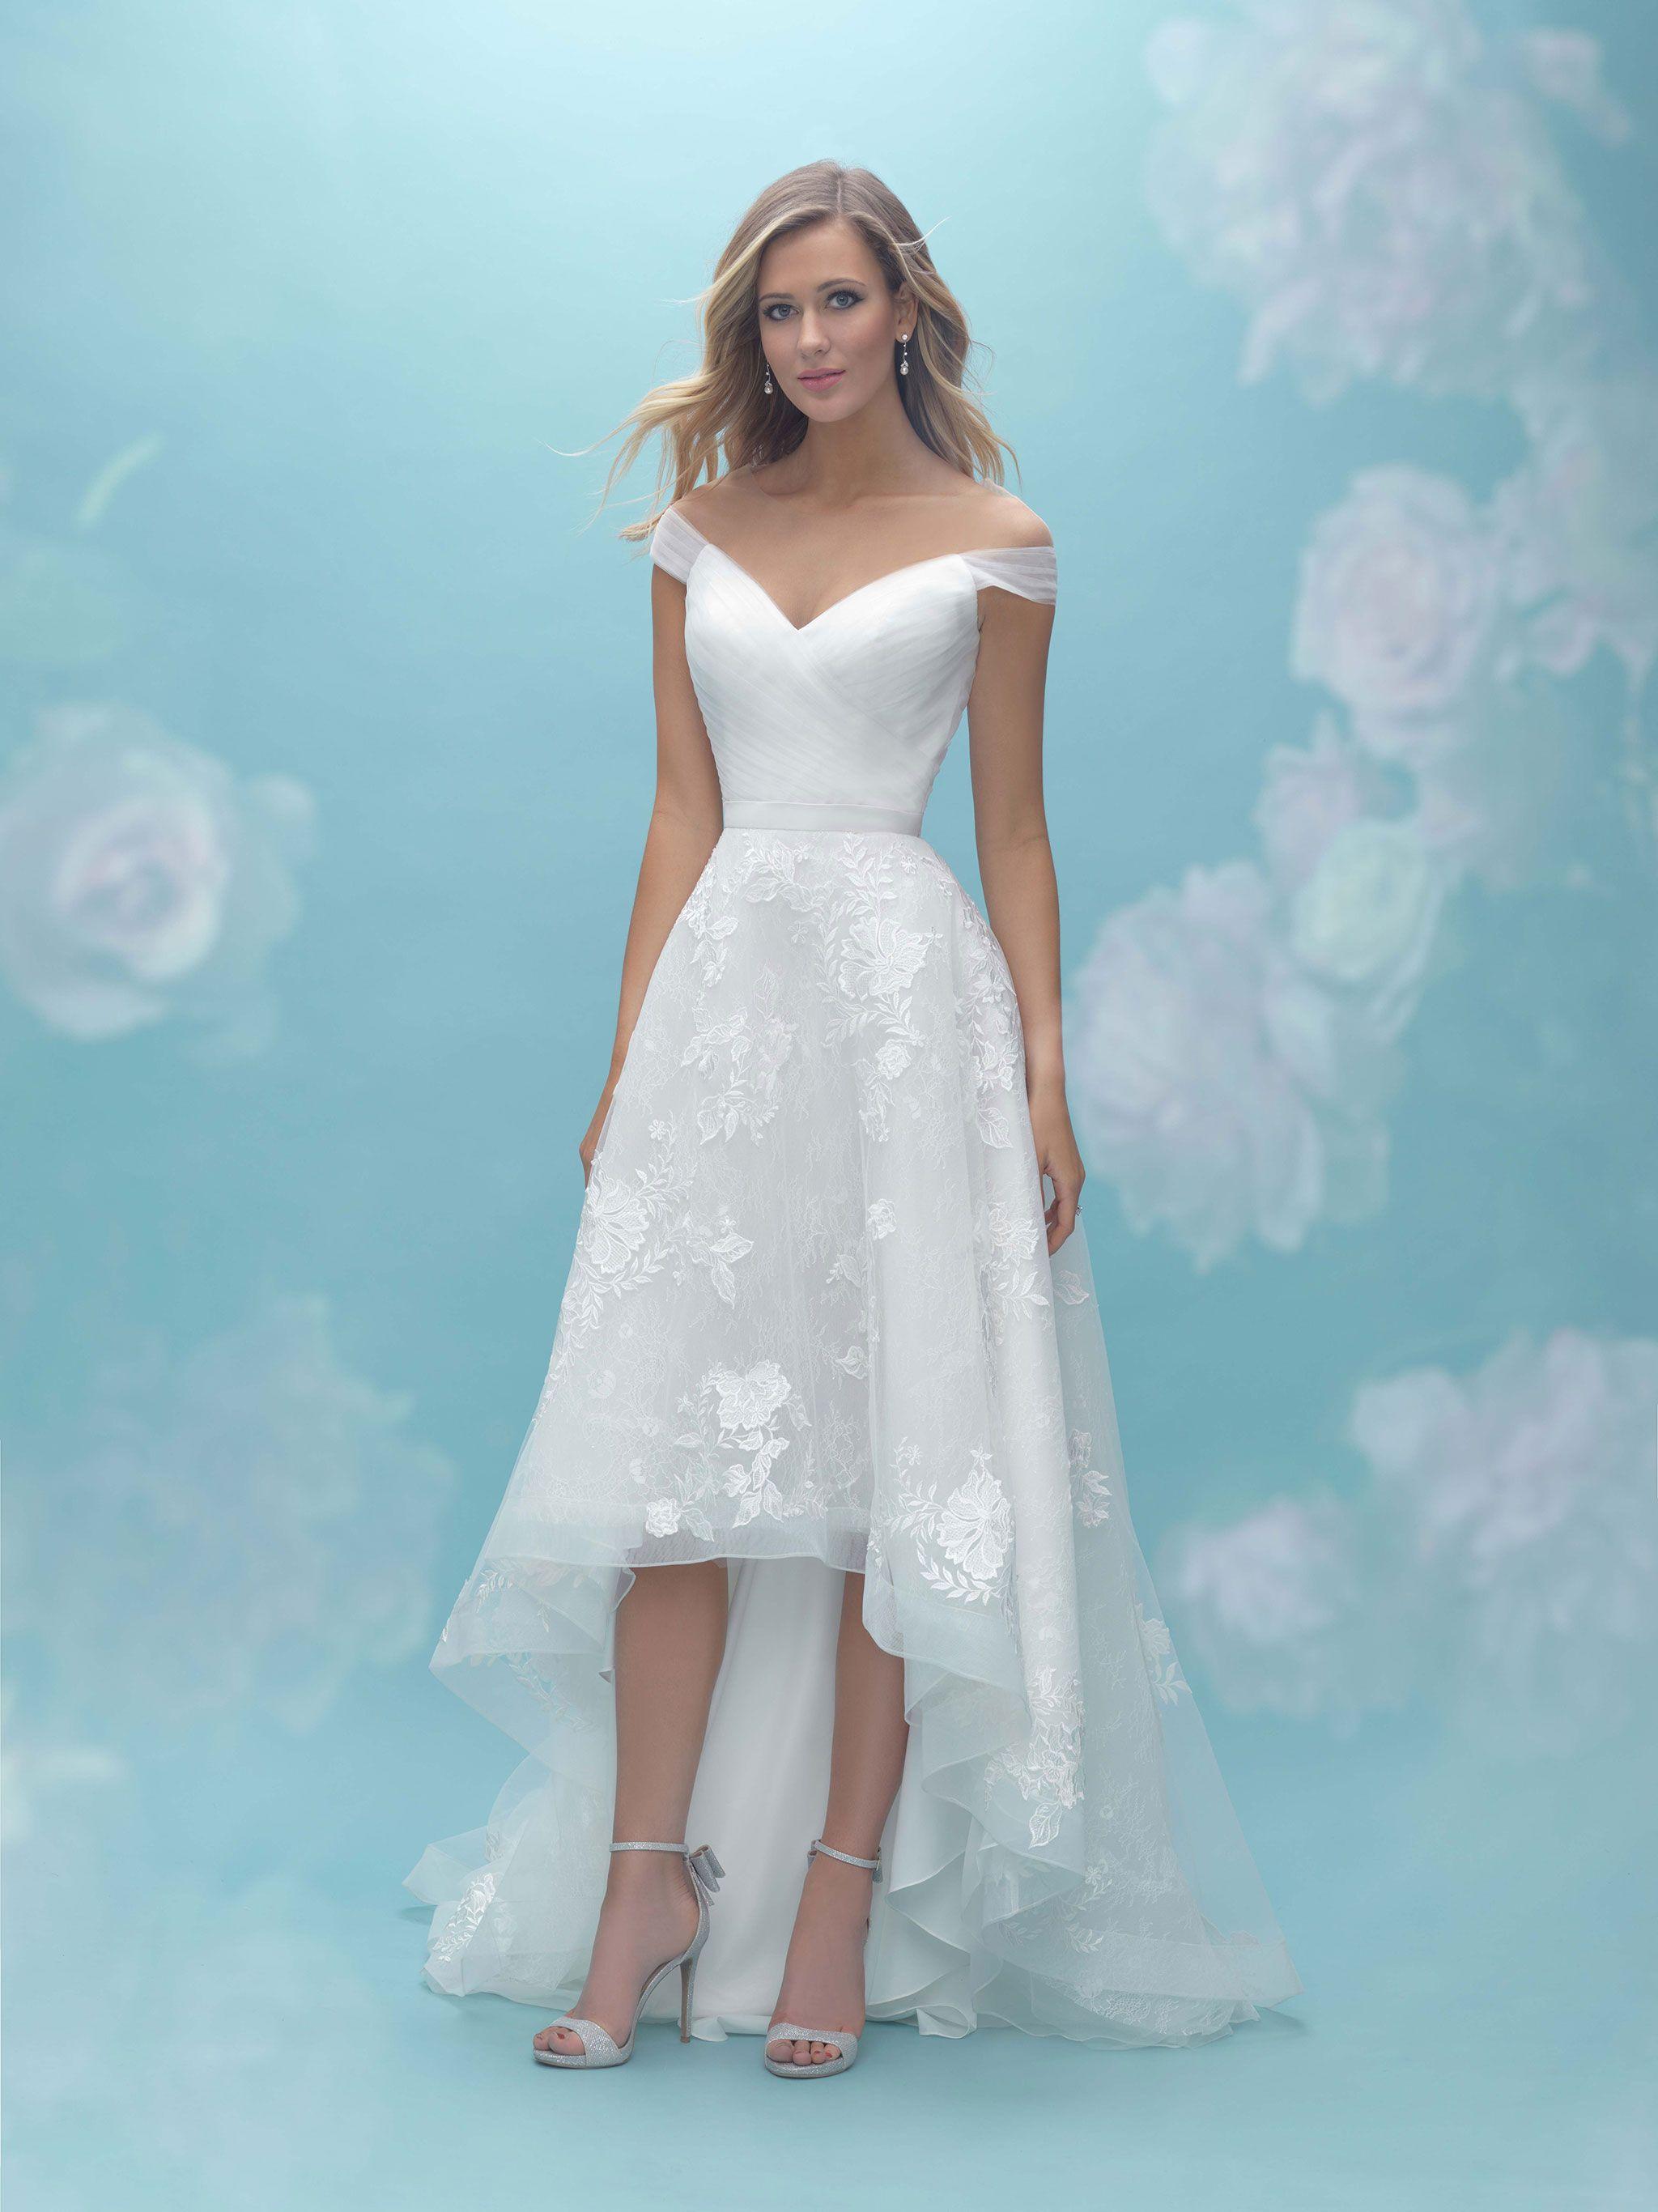 Allure Bridal | dresses only | Pinterest | Allure bridal, Wedding ...